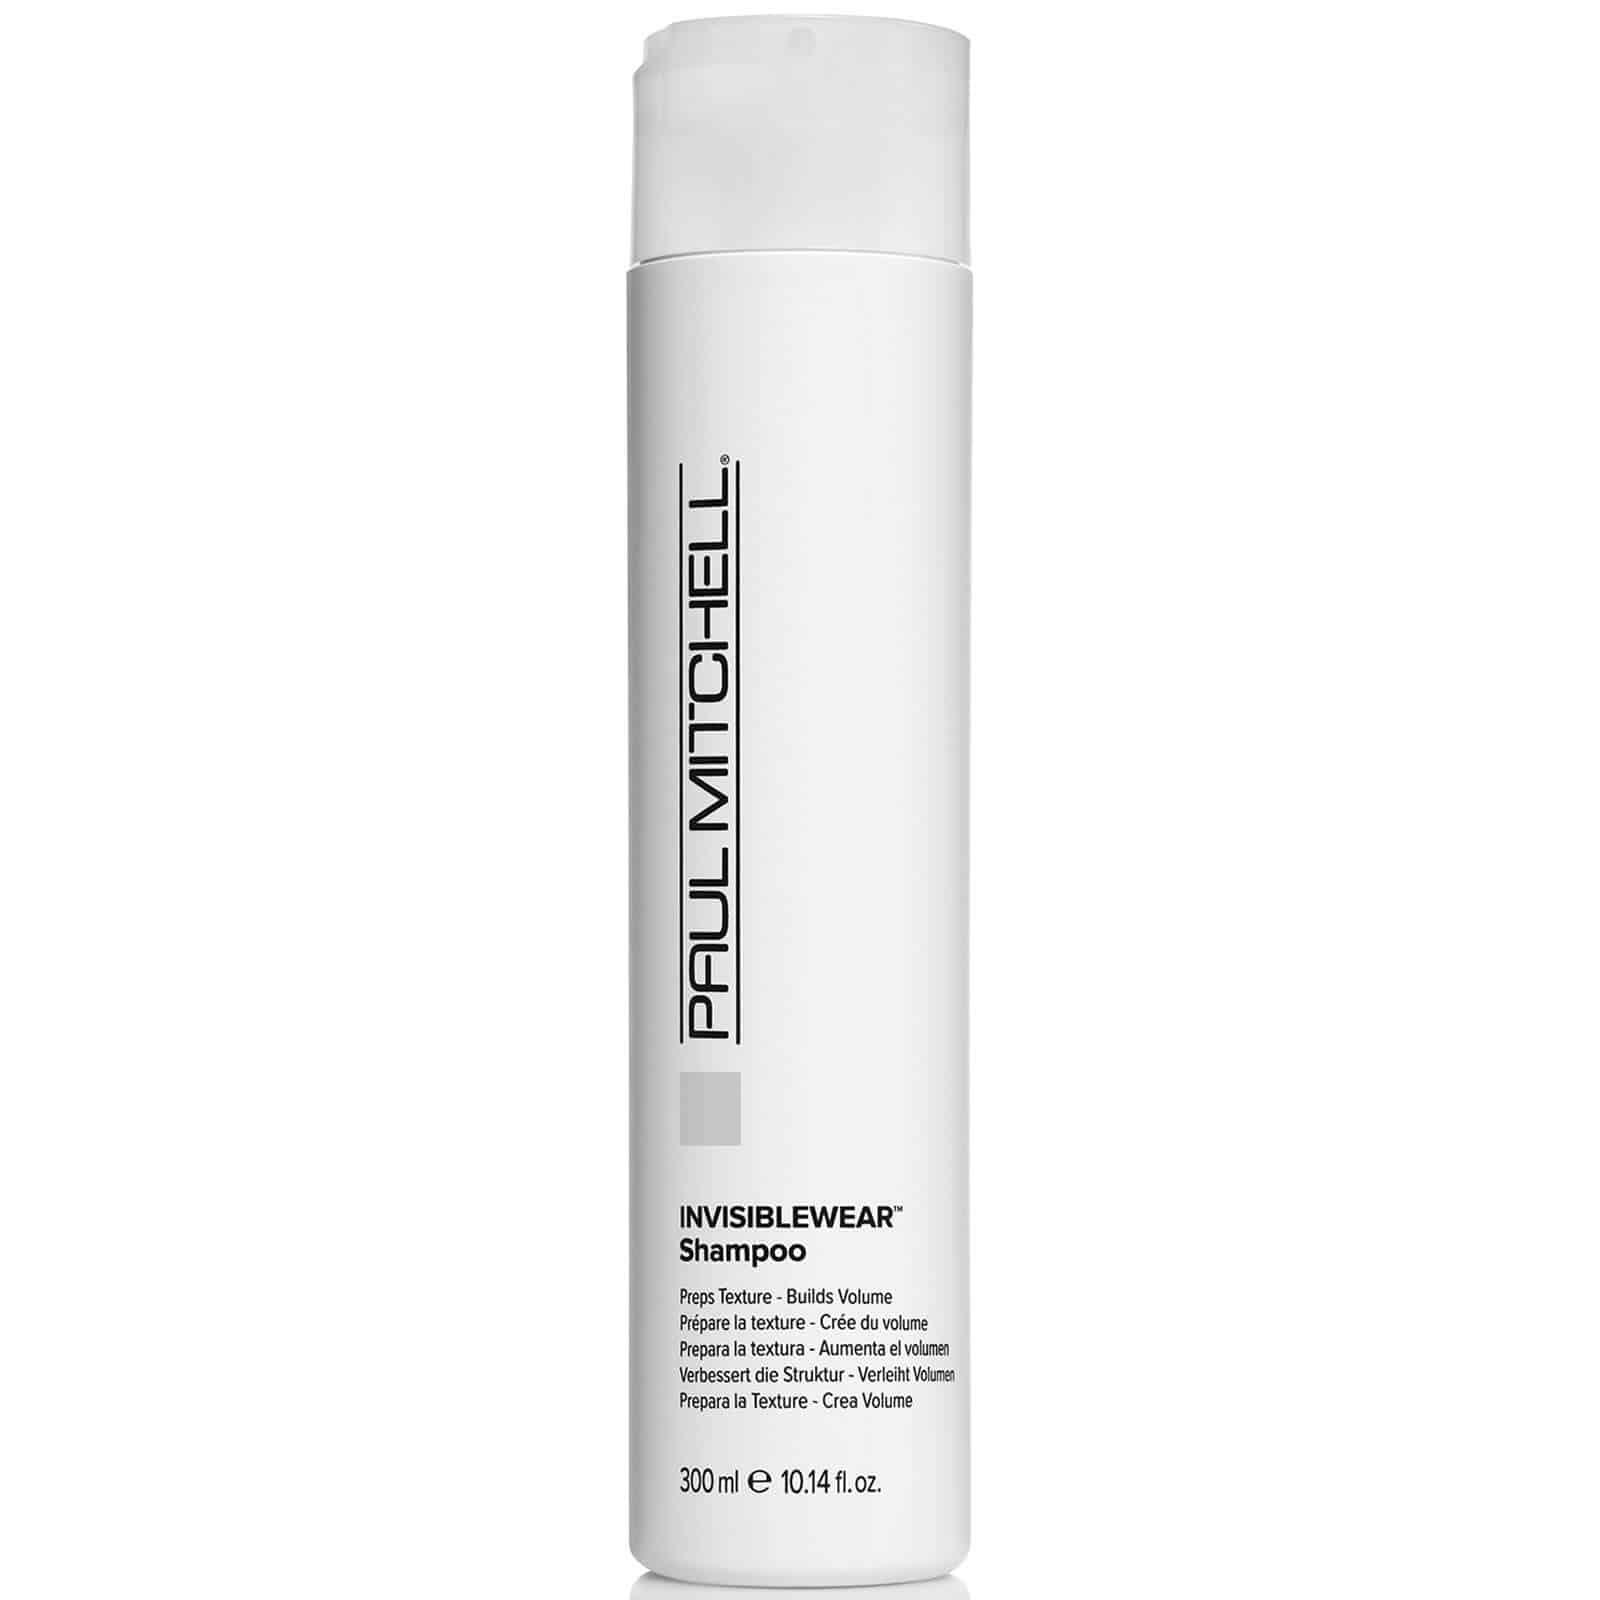 Paul Mitchell Invisiblewear Shampoo 300ml